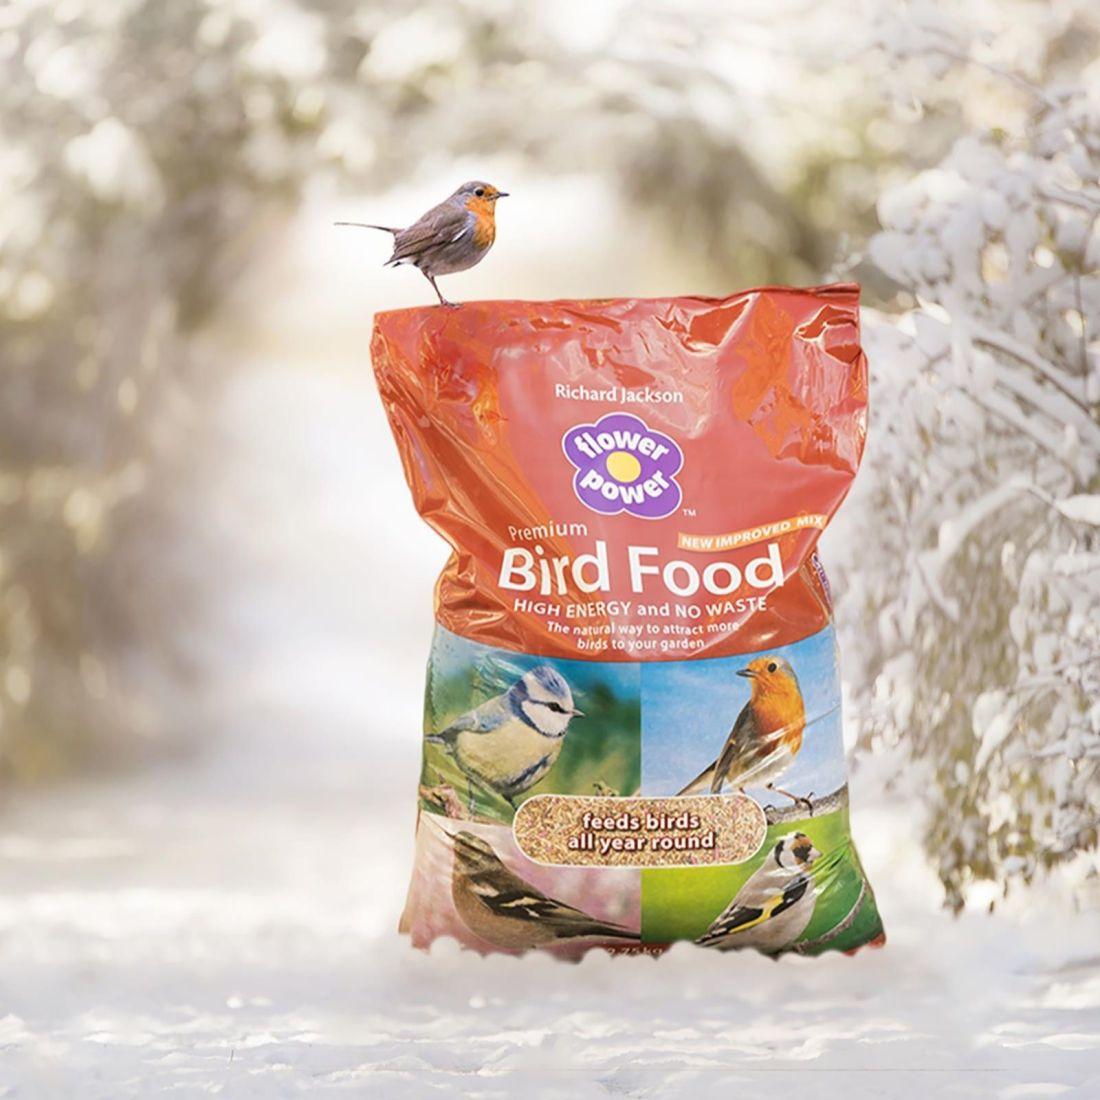 Richard Jackson bird food